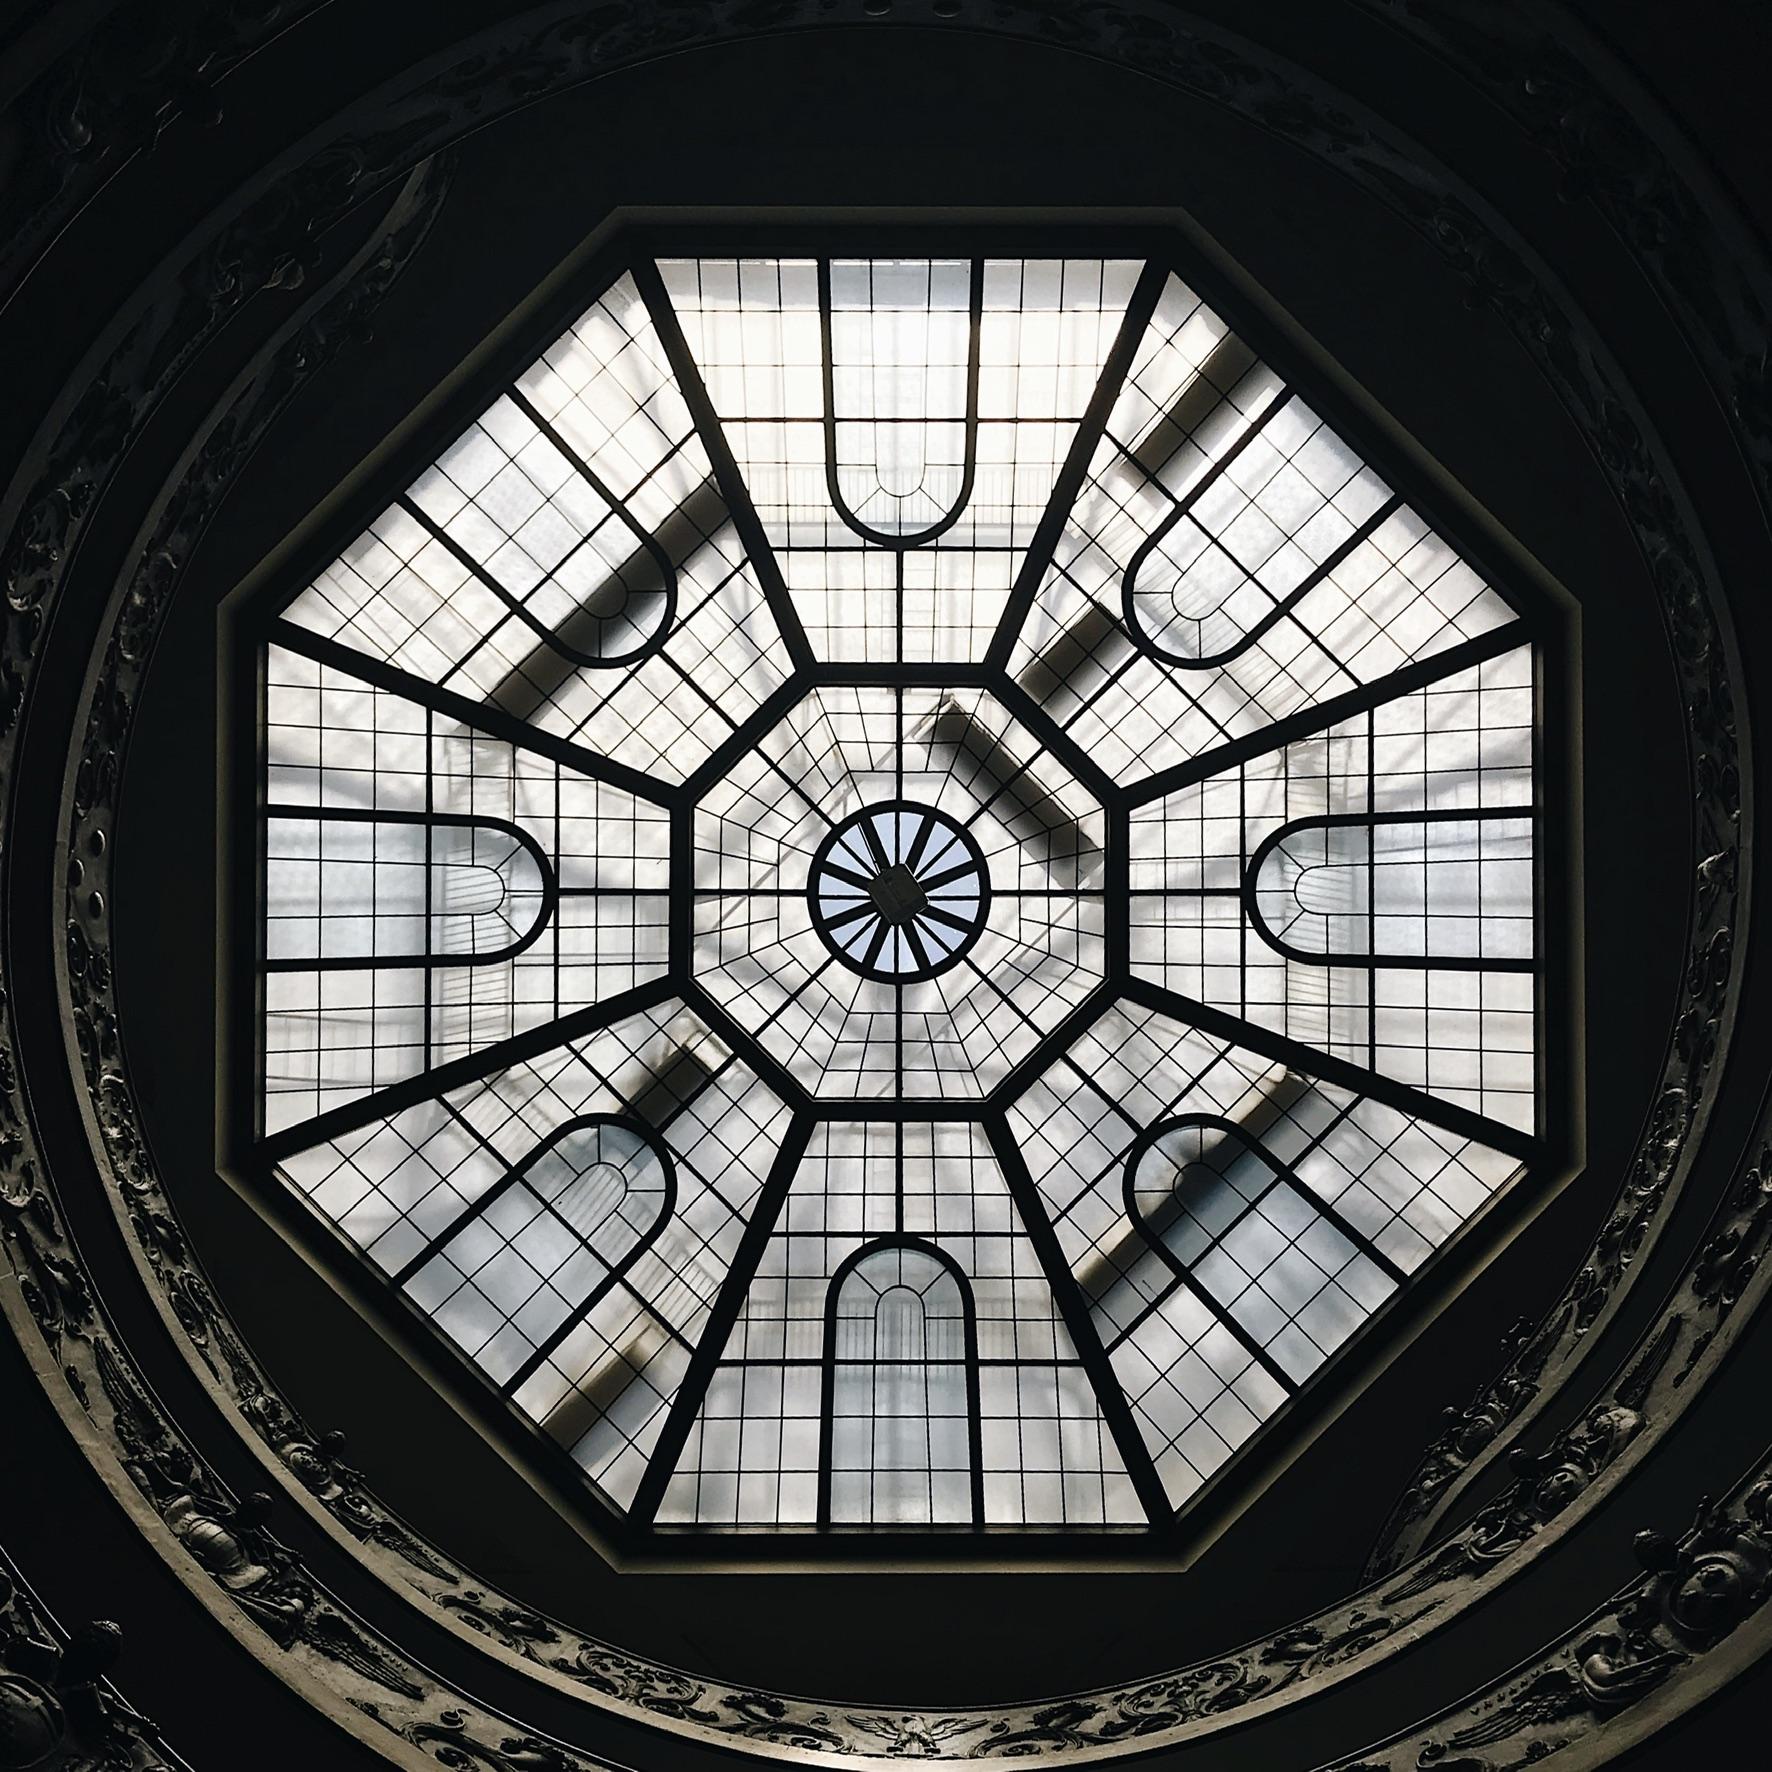 Vue de bas escalier - Msuée du Vatican